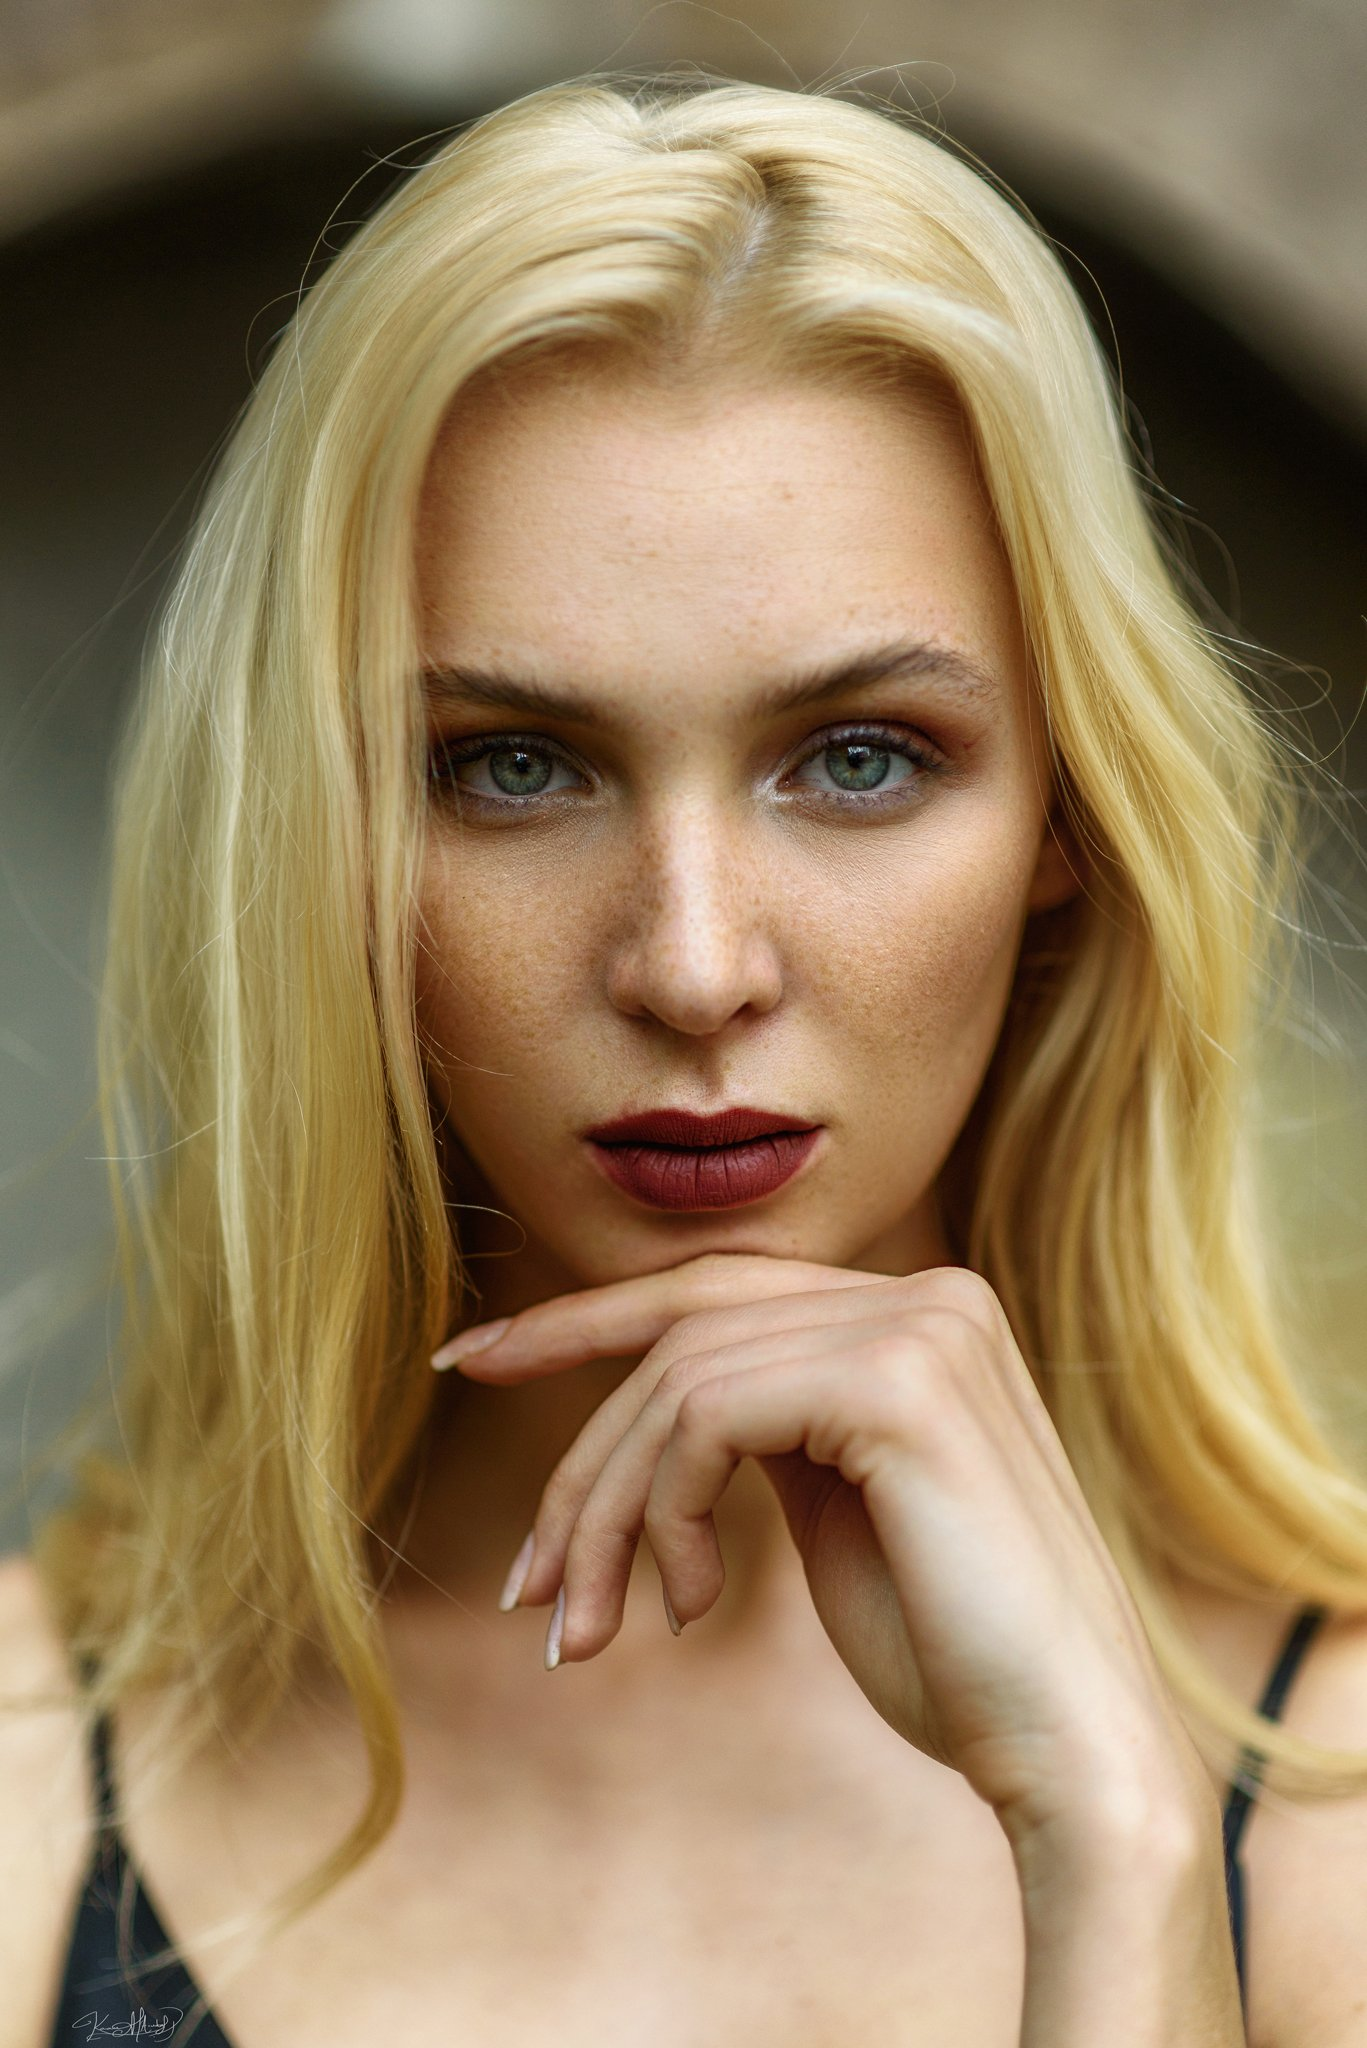 eyes, face, beauty, colorful, natural, light, beautiful, pretty, model, portrait, fashion, yellow, 85mm, nikon, daylight, Каан Алтындал